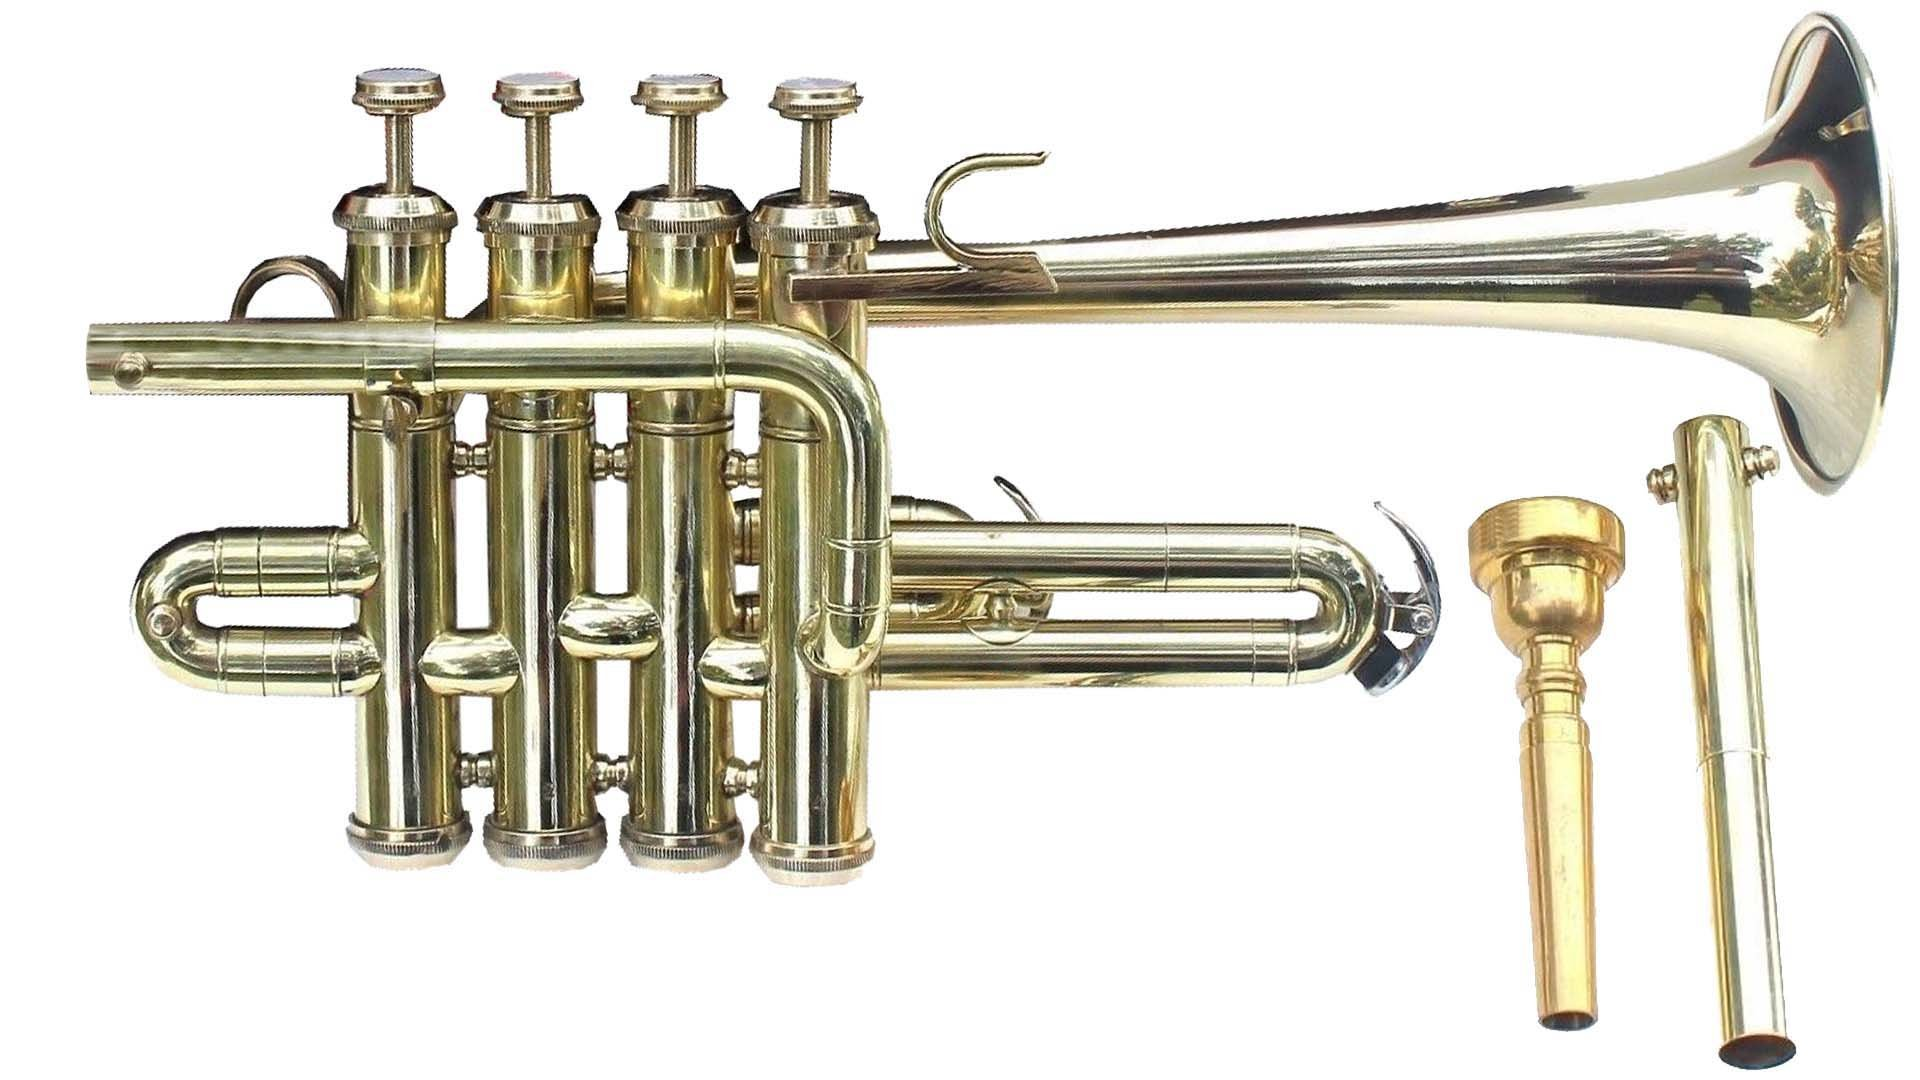 SC EXPORTS Piccolo Trumpet Brass Finish Picollo Bb/A Pitch W/Case-Mp Gold by SCEXPORTS